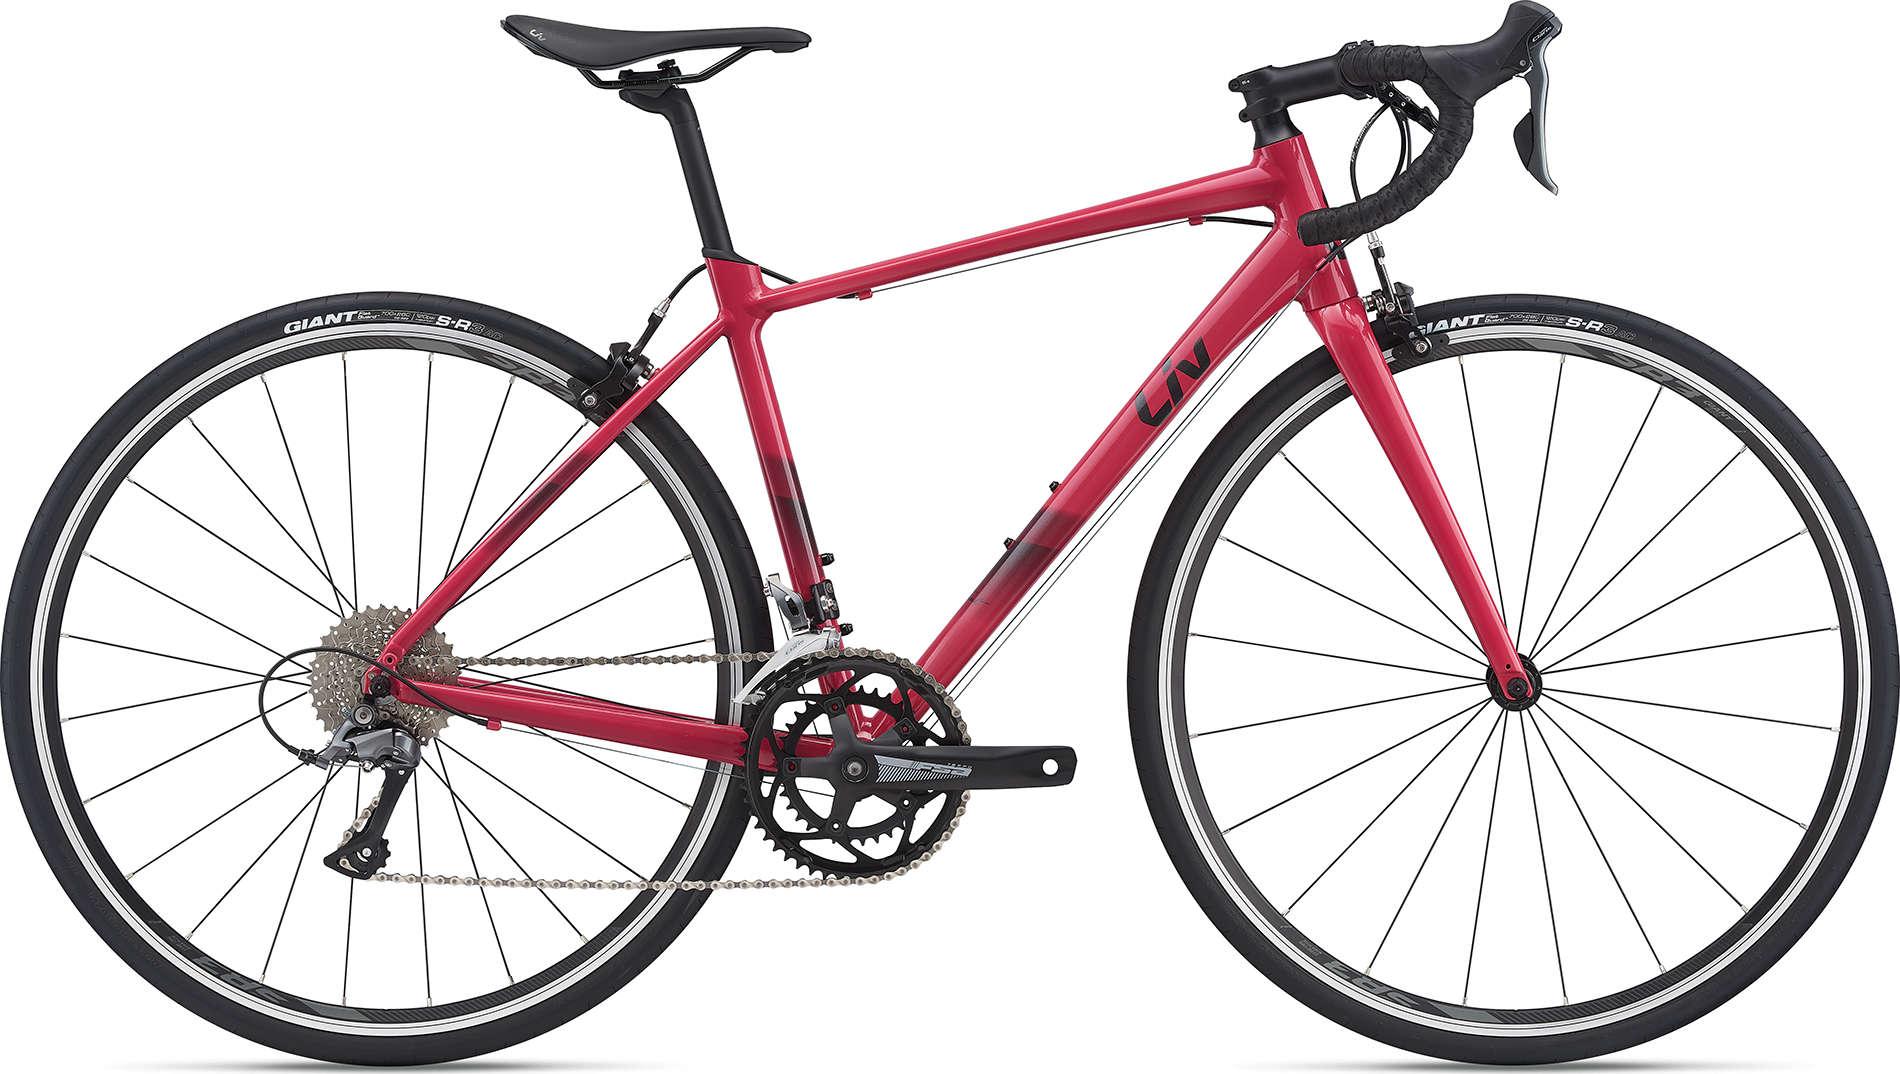 Велосипед Giant LIV Avail 2 (2021)